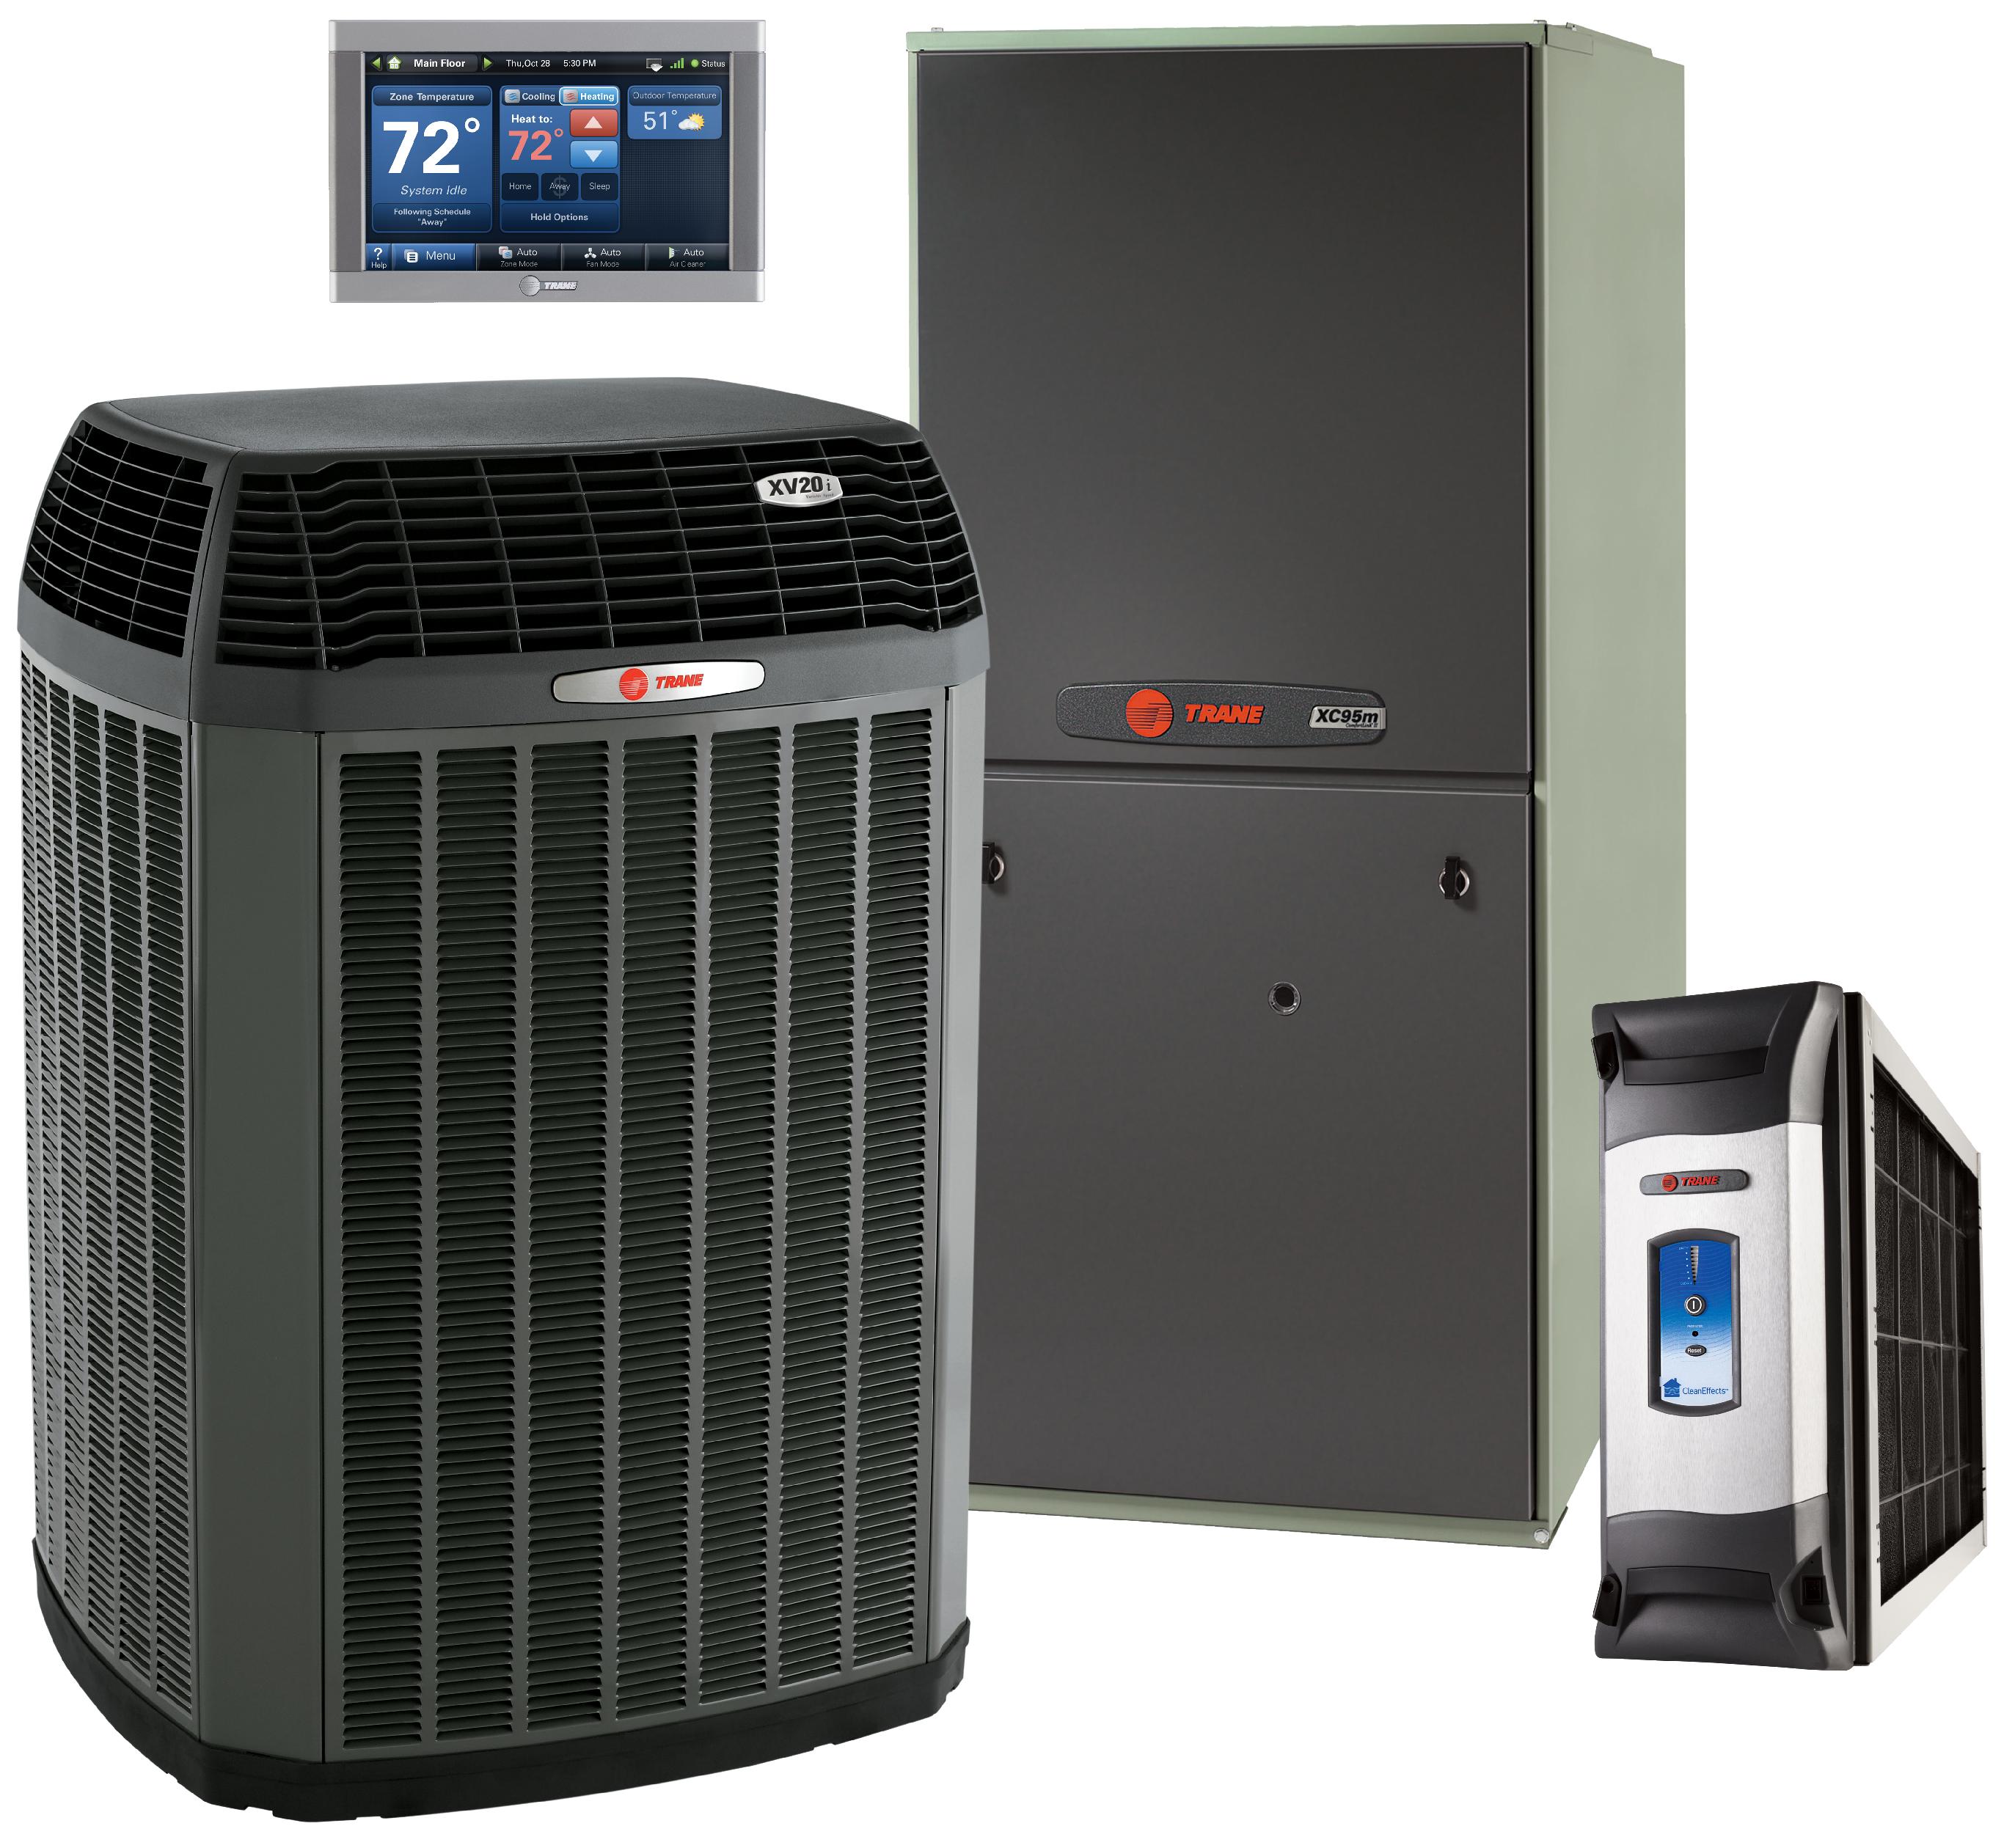 Trane Equipment Air Conditioning Installation Trane Air Conditioner